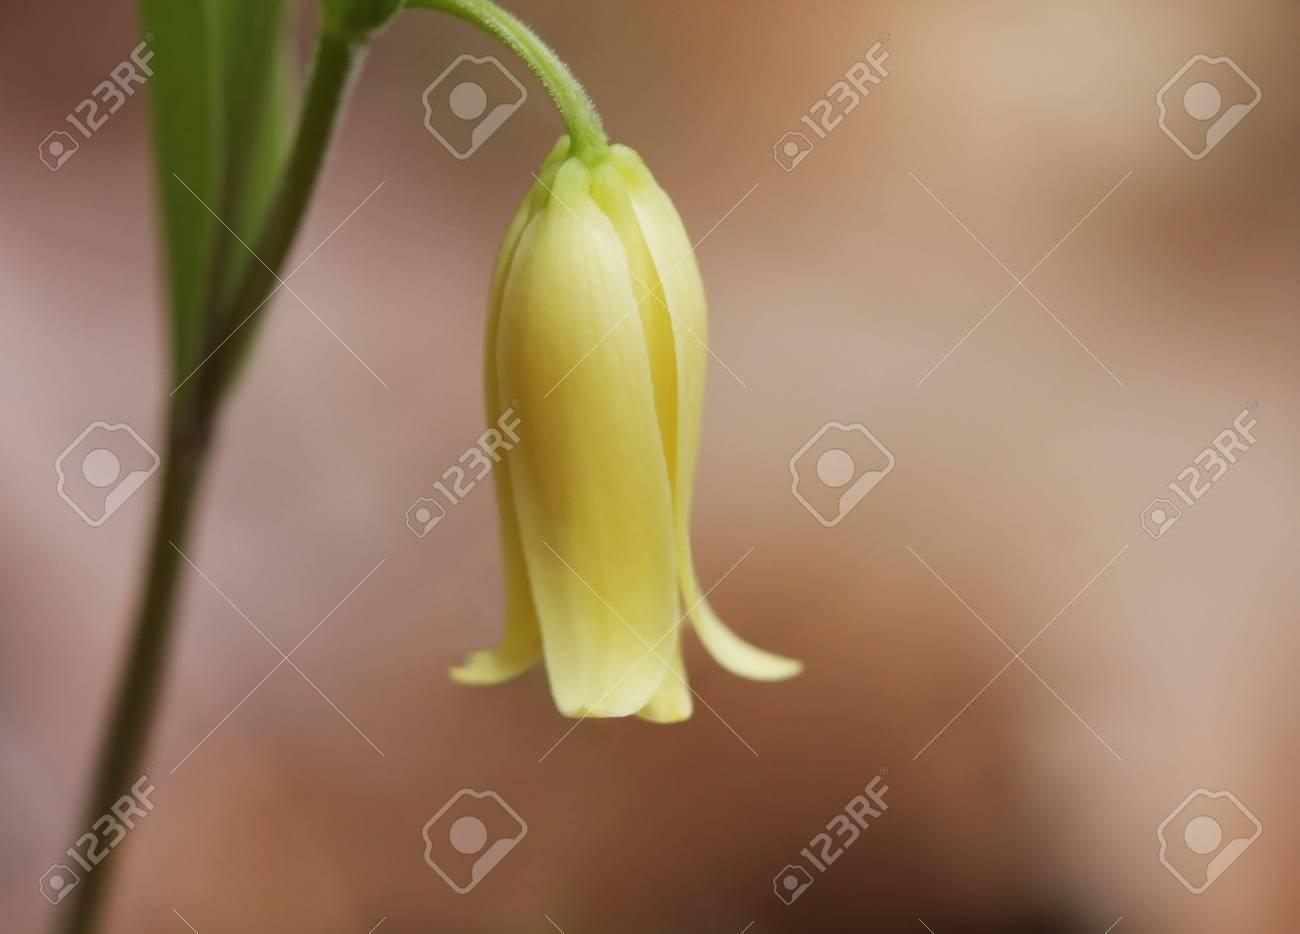 Sessile Leaf Bellwort Sessile Leaf Bellwort